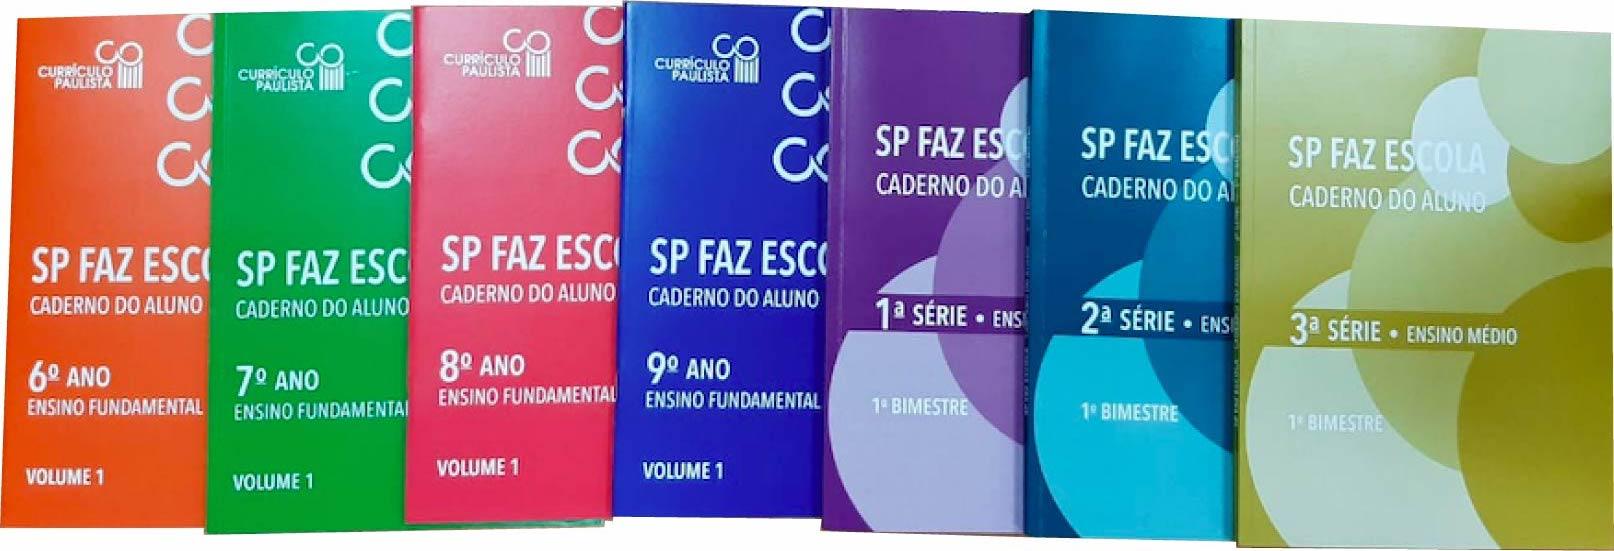 Sao Paulo Faz Escola Secretaria Da Educacao Do Estado De Sao Paulo